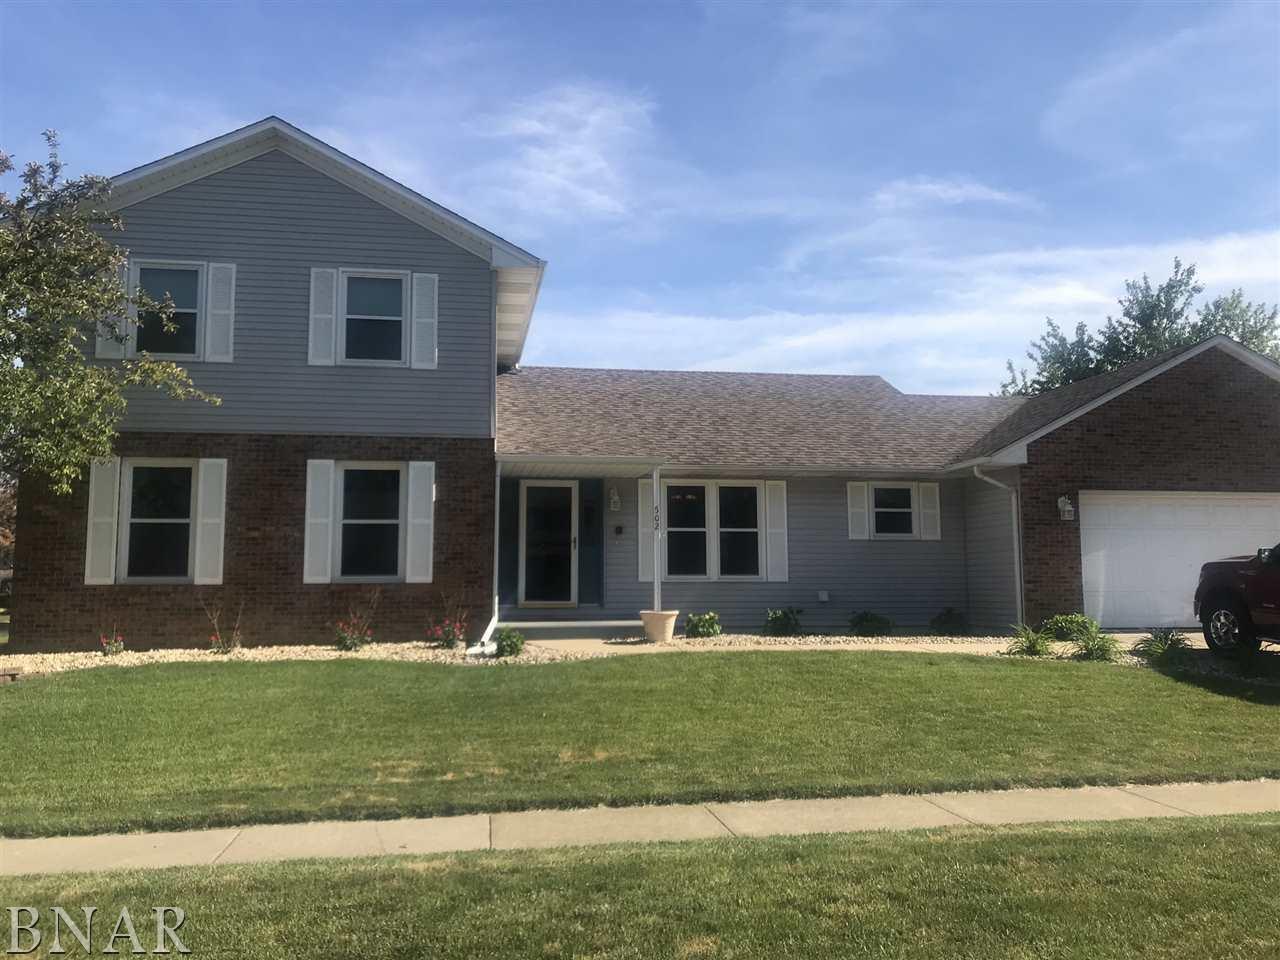 Real Estate in Bloomington, IL